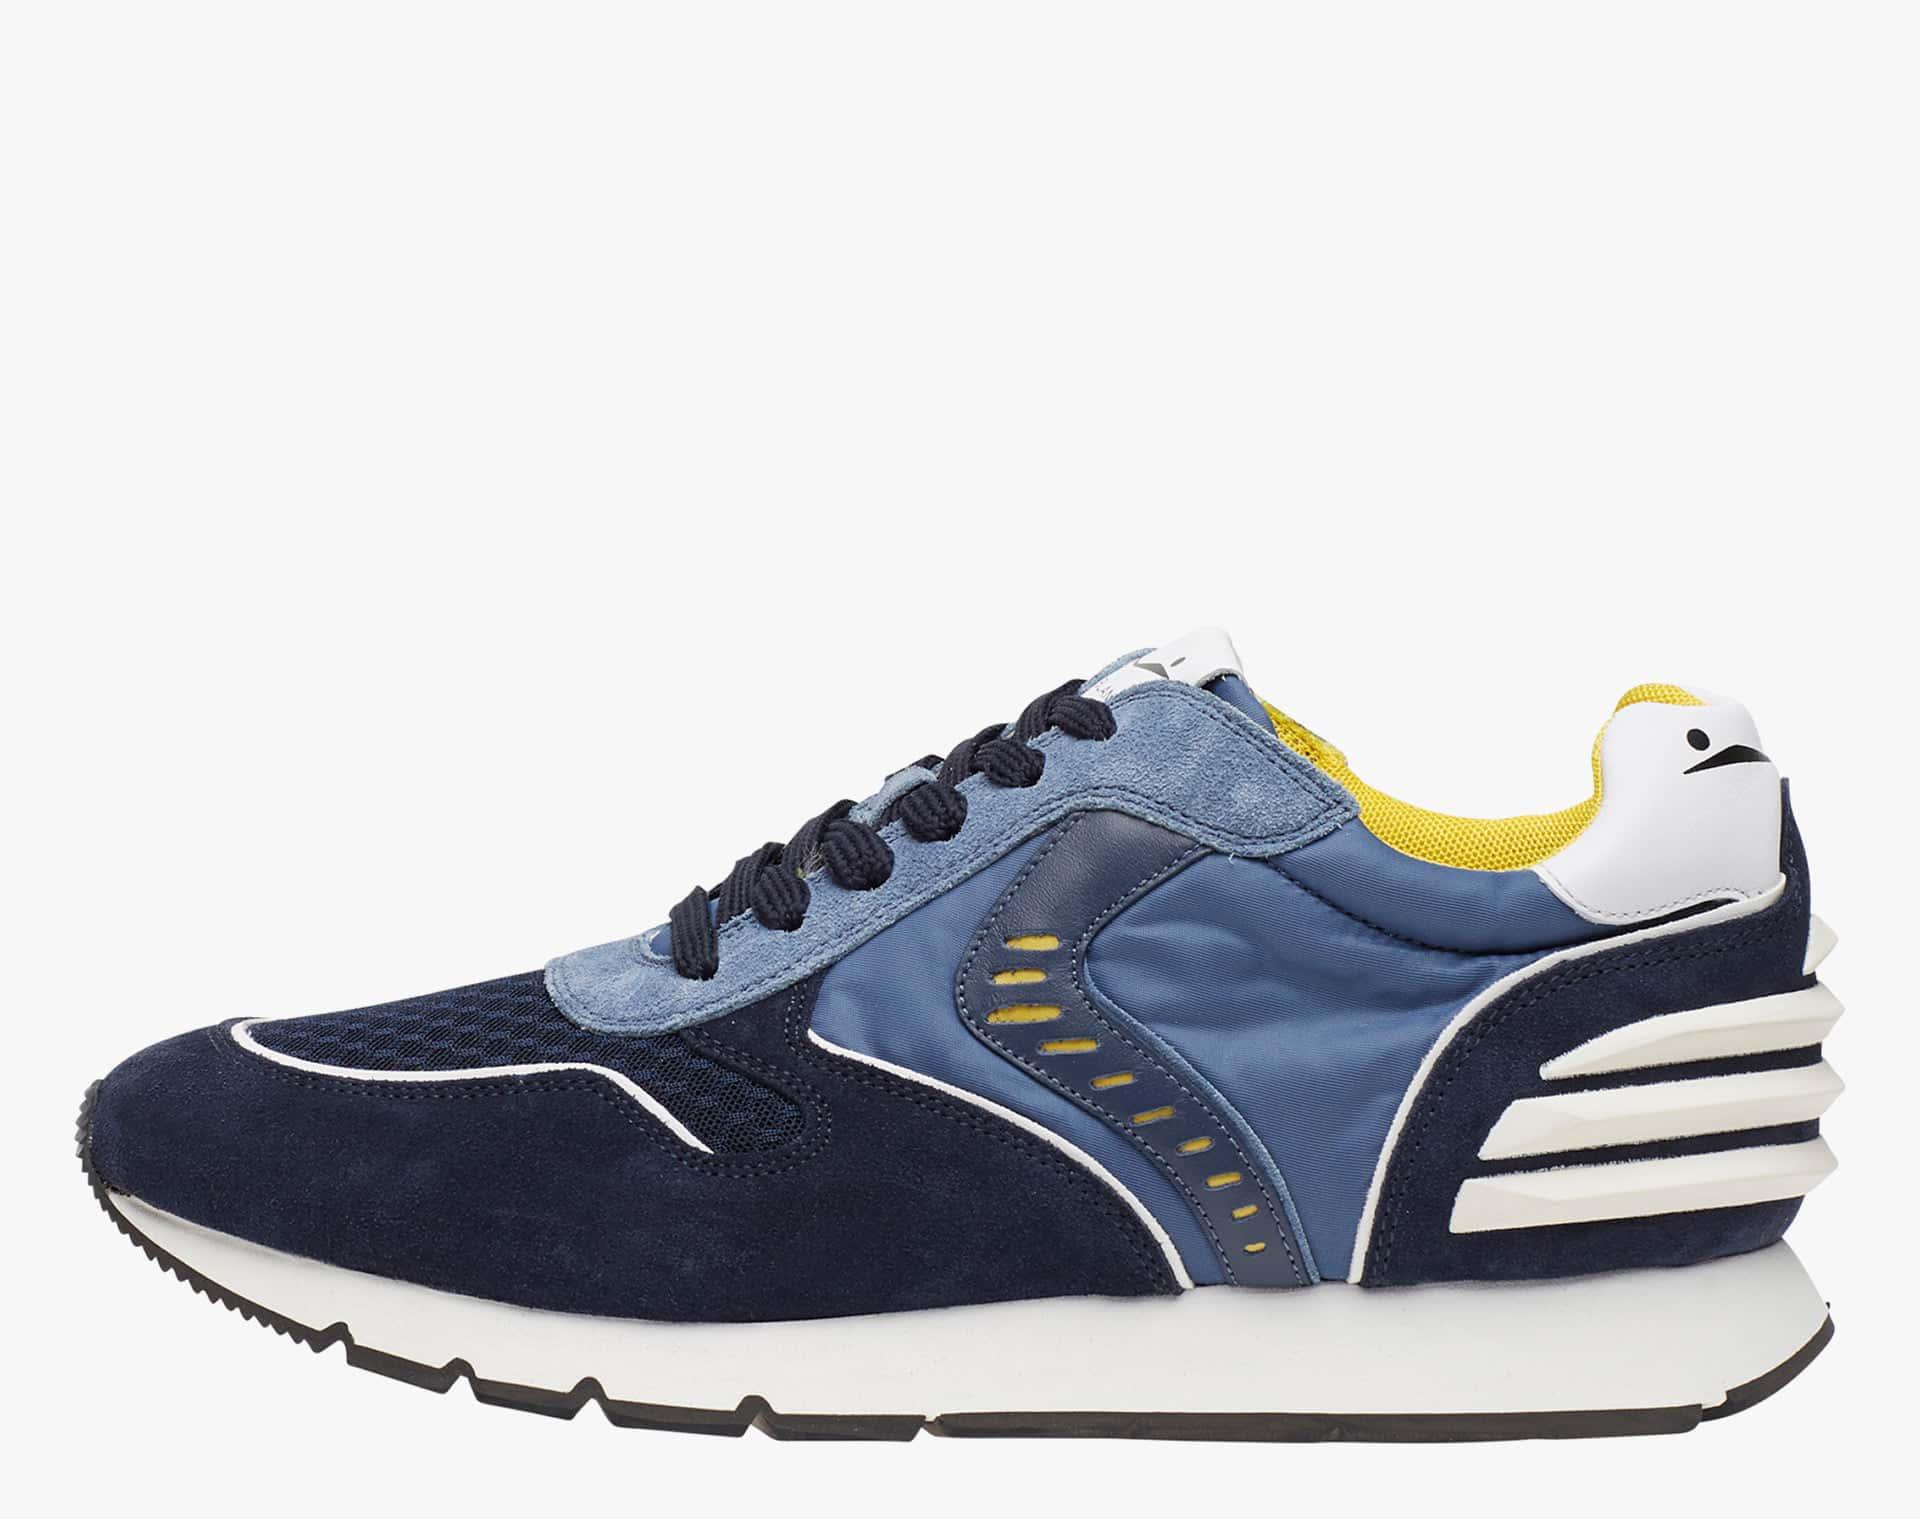 LIAM POWER II - Sneaker in suede e tessuto tecnico - Blu